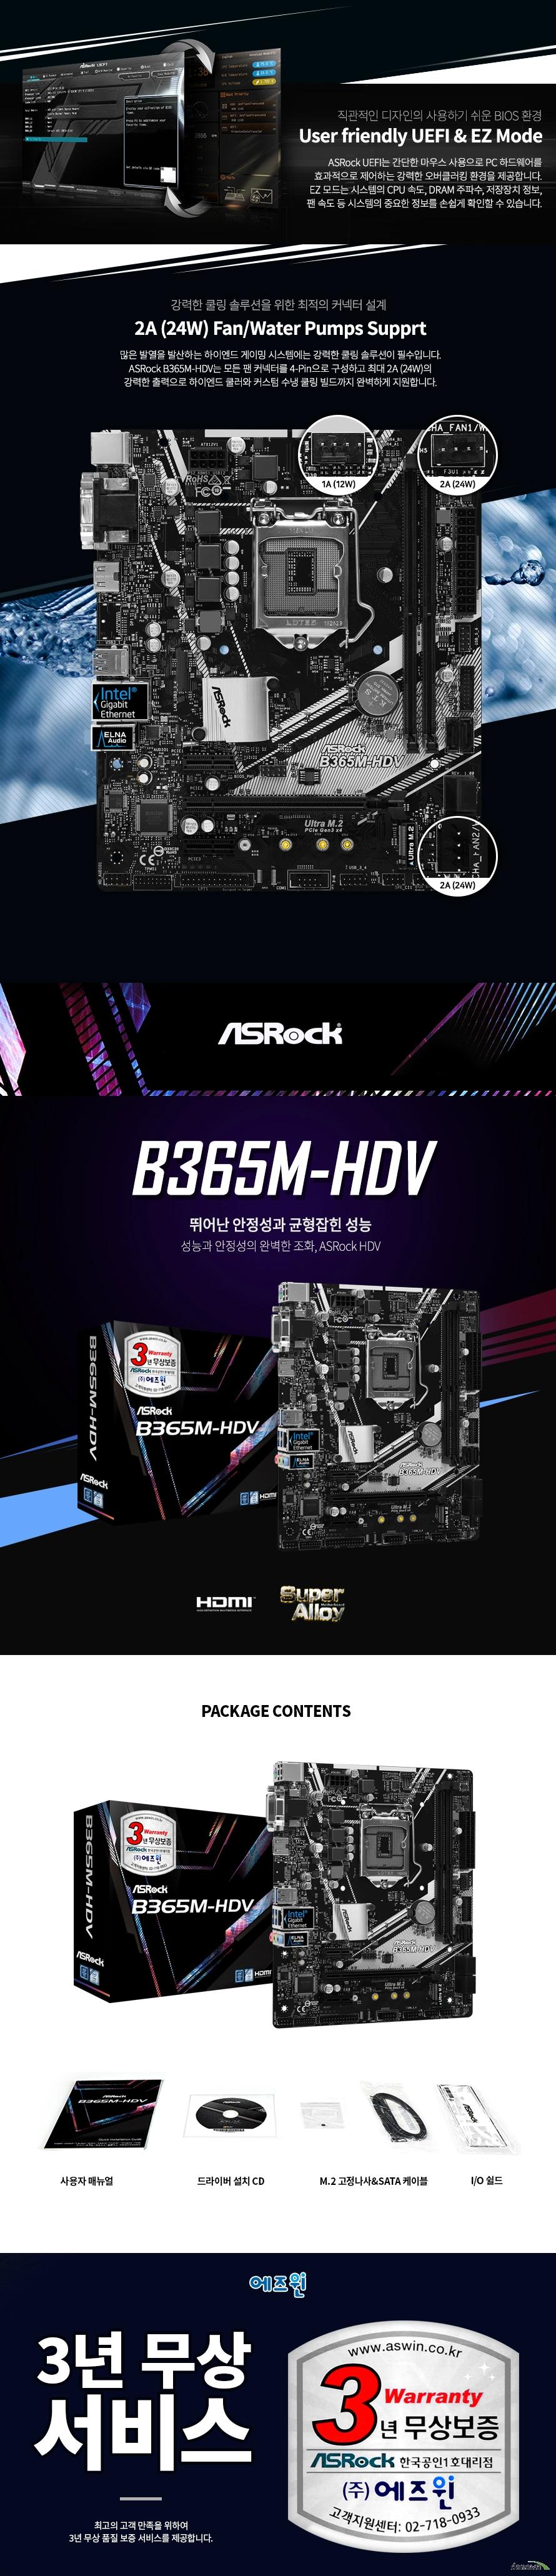 ASRock  B365M-HDV 에즈윈